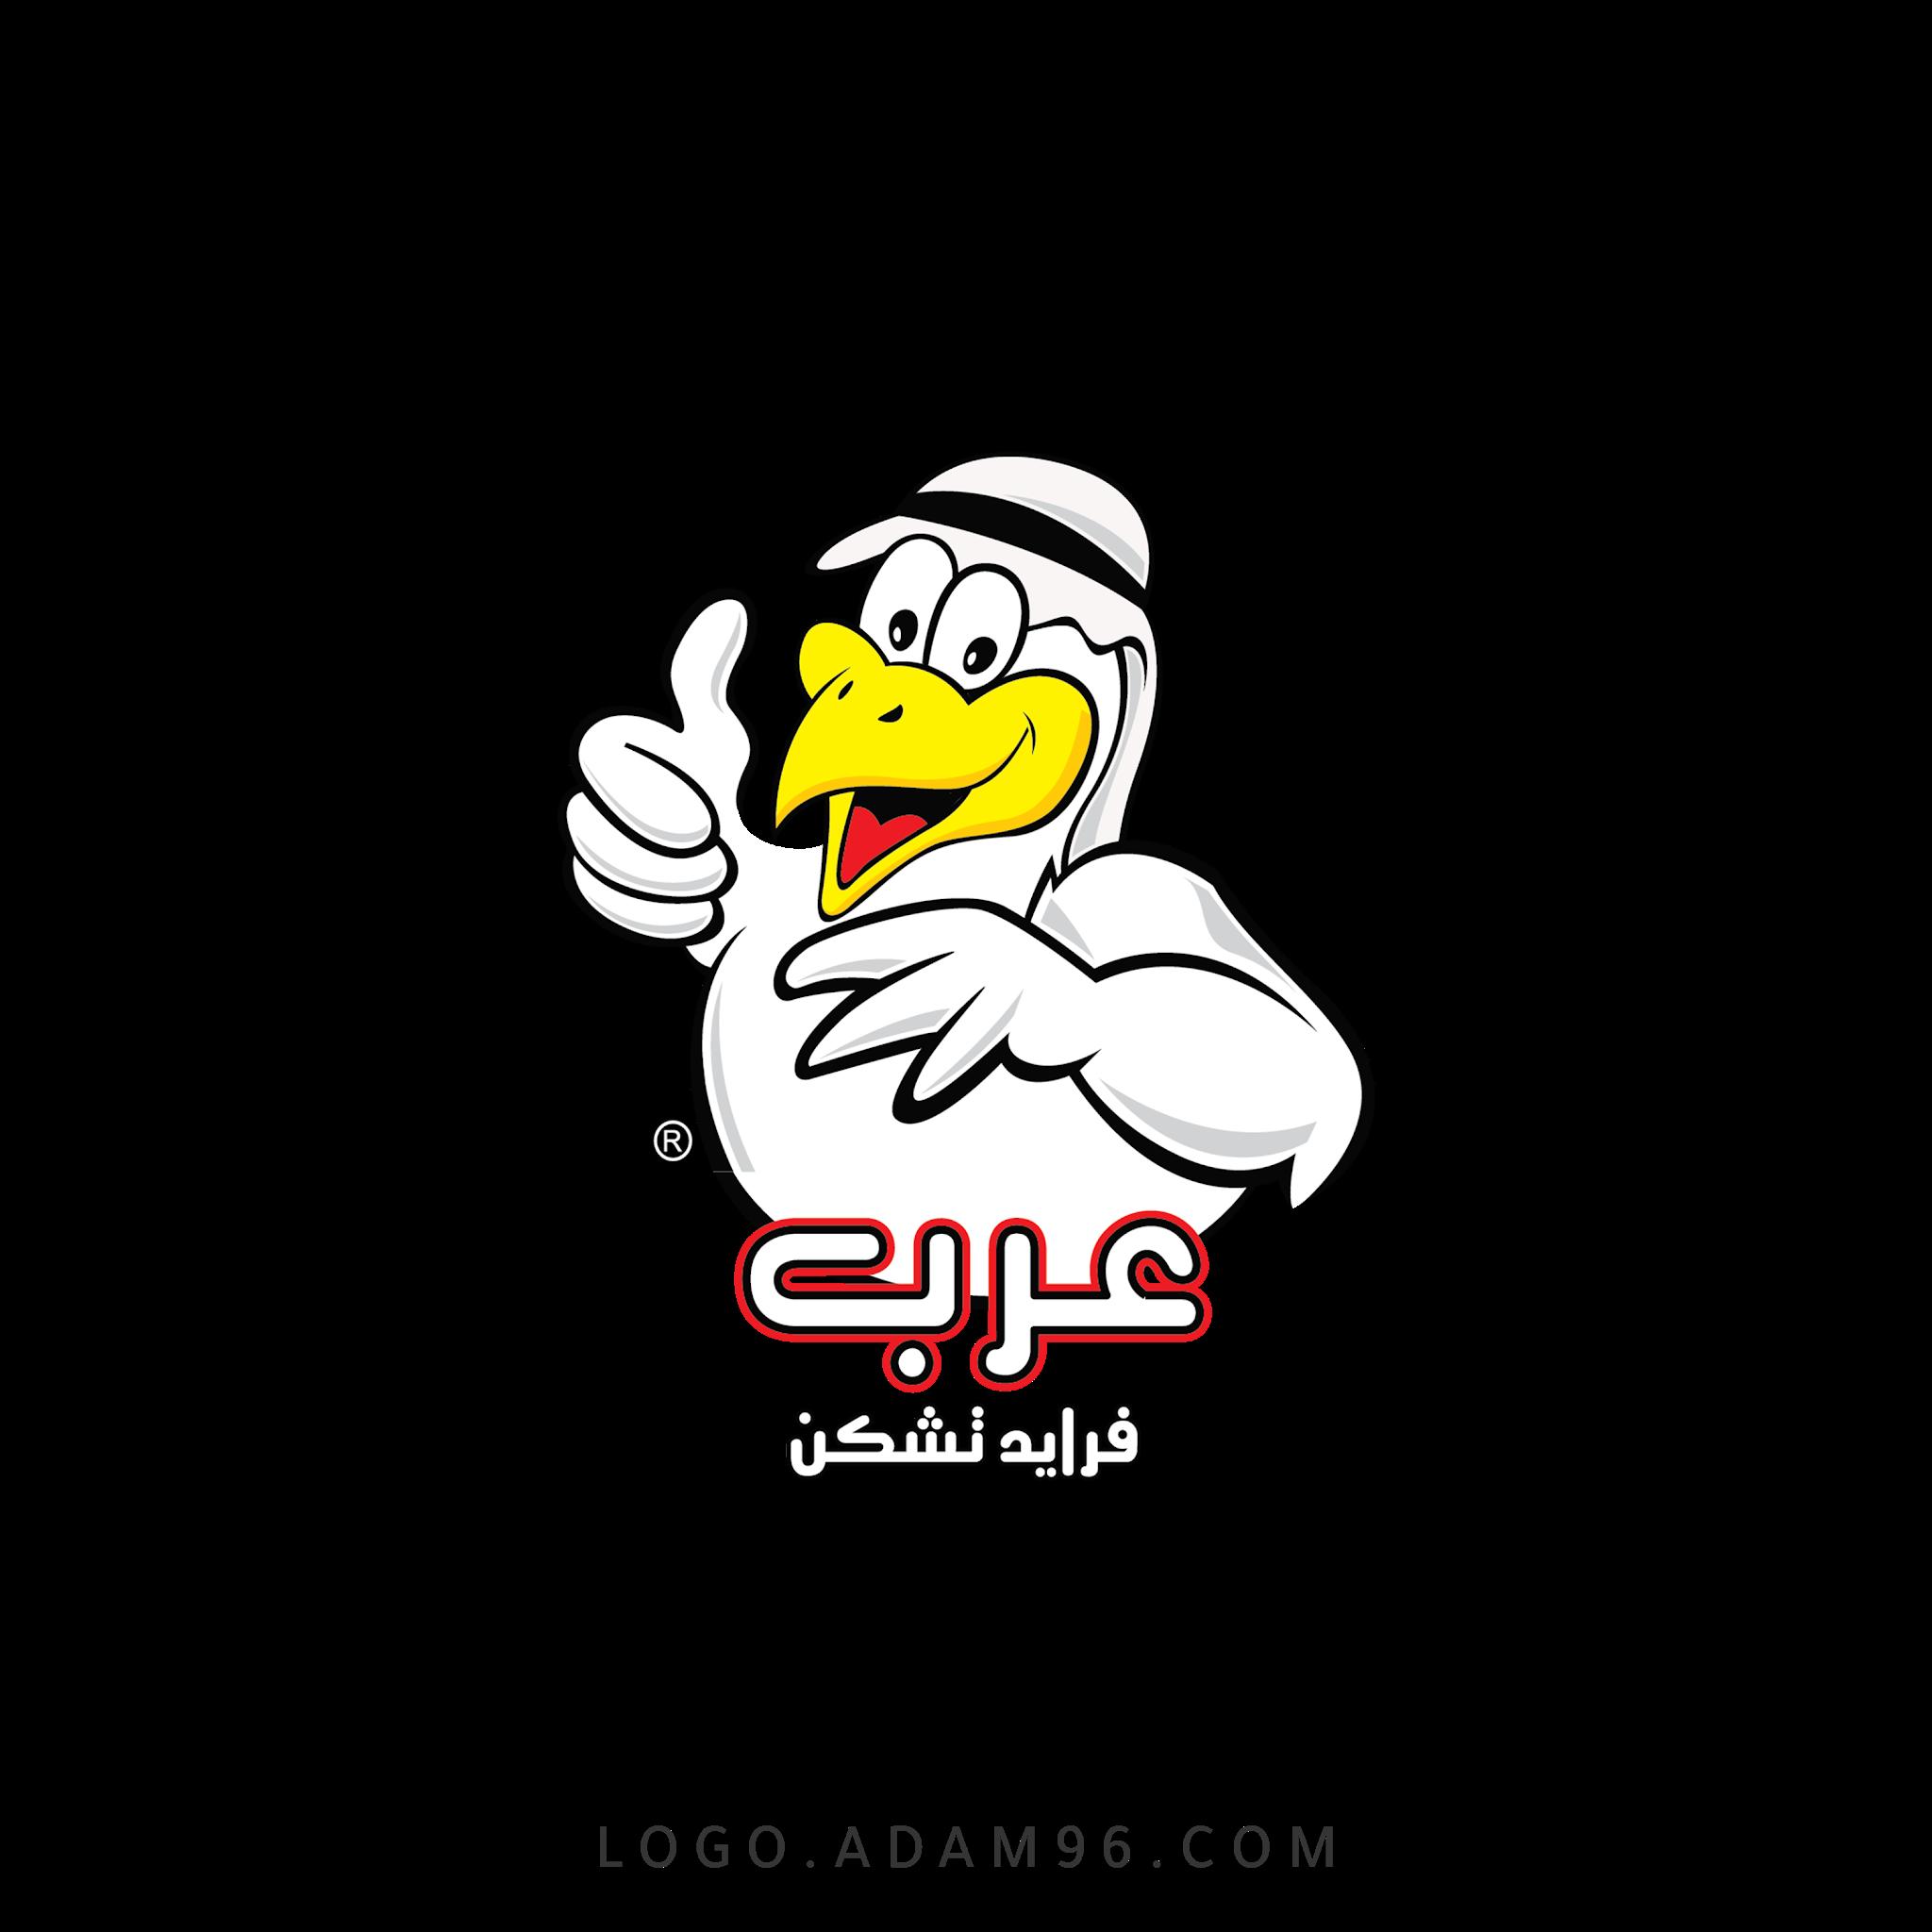 تحميل شعار عرب فرايد تشكن لوجو رسمي عالي الجودة PNG